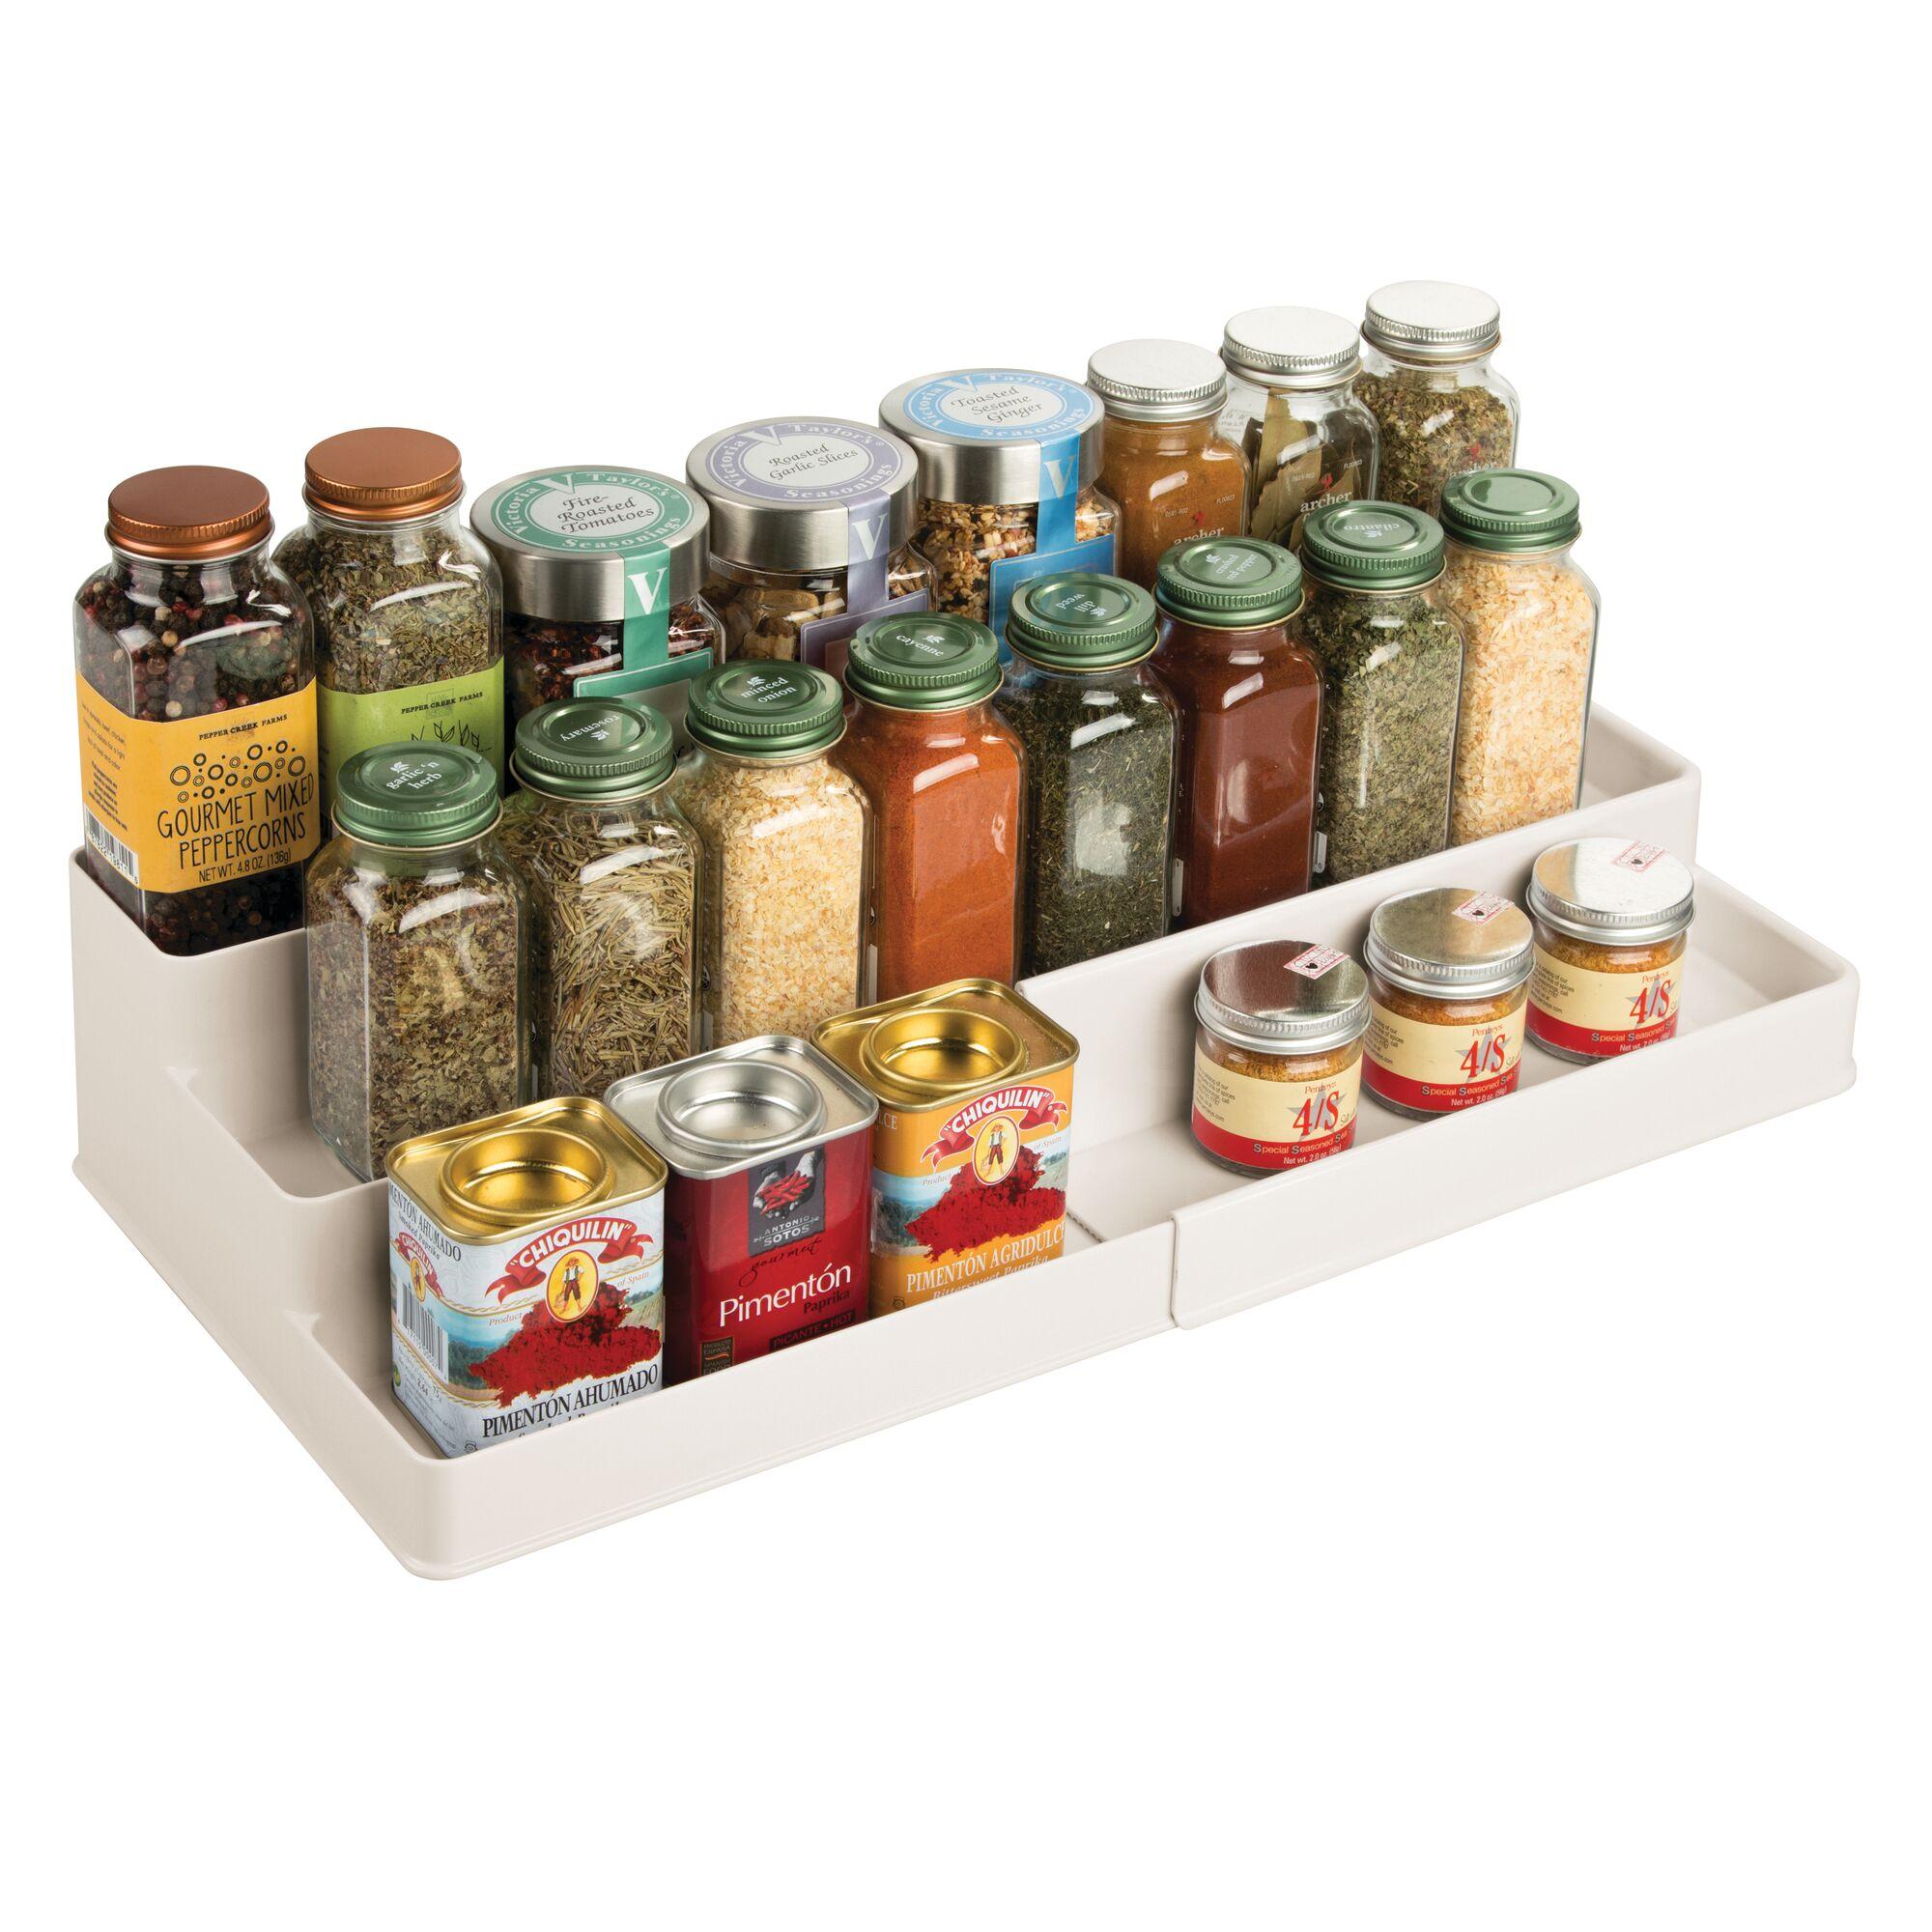 mDesign-Expandable-Kitchen-Cabinet-Pantry-Organizer-Spice-Rack thumbnail 37